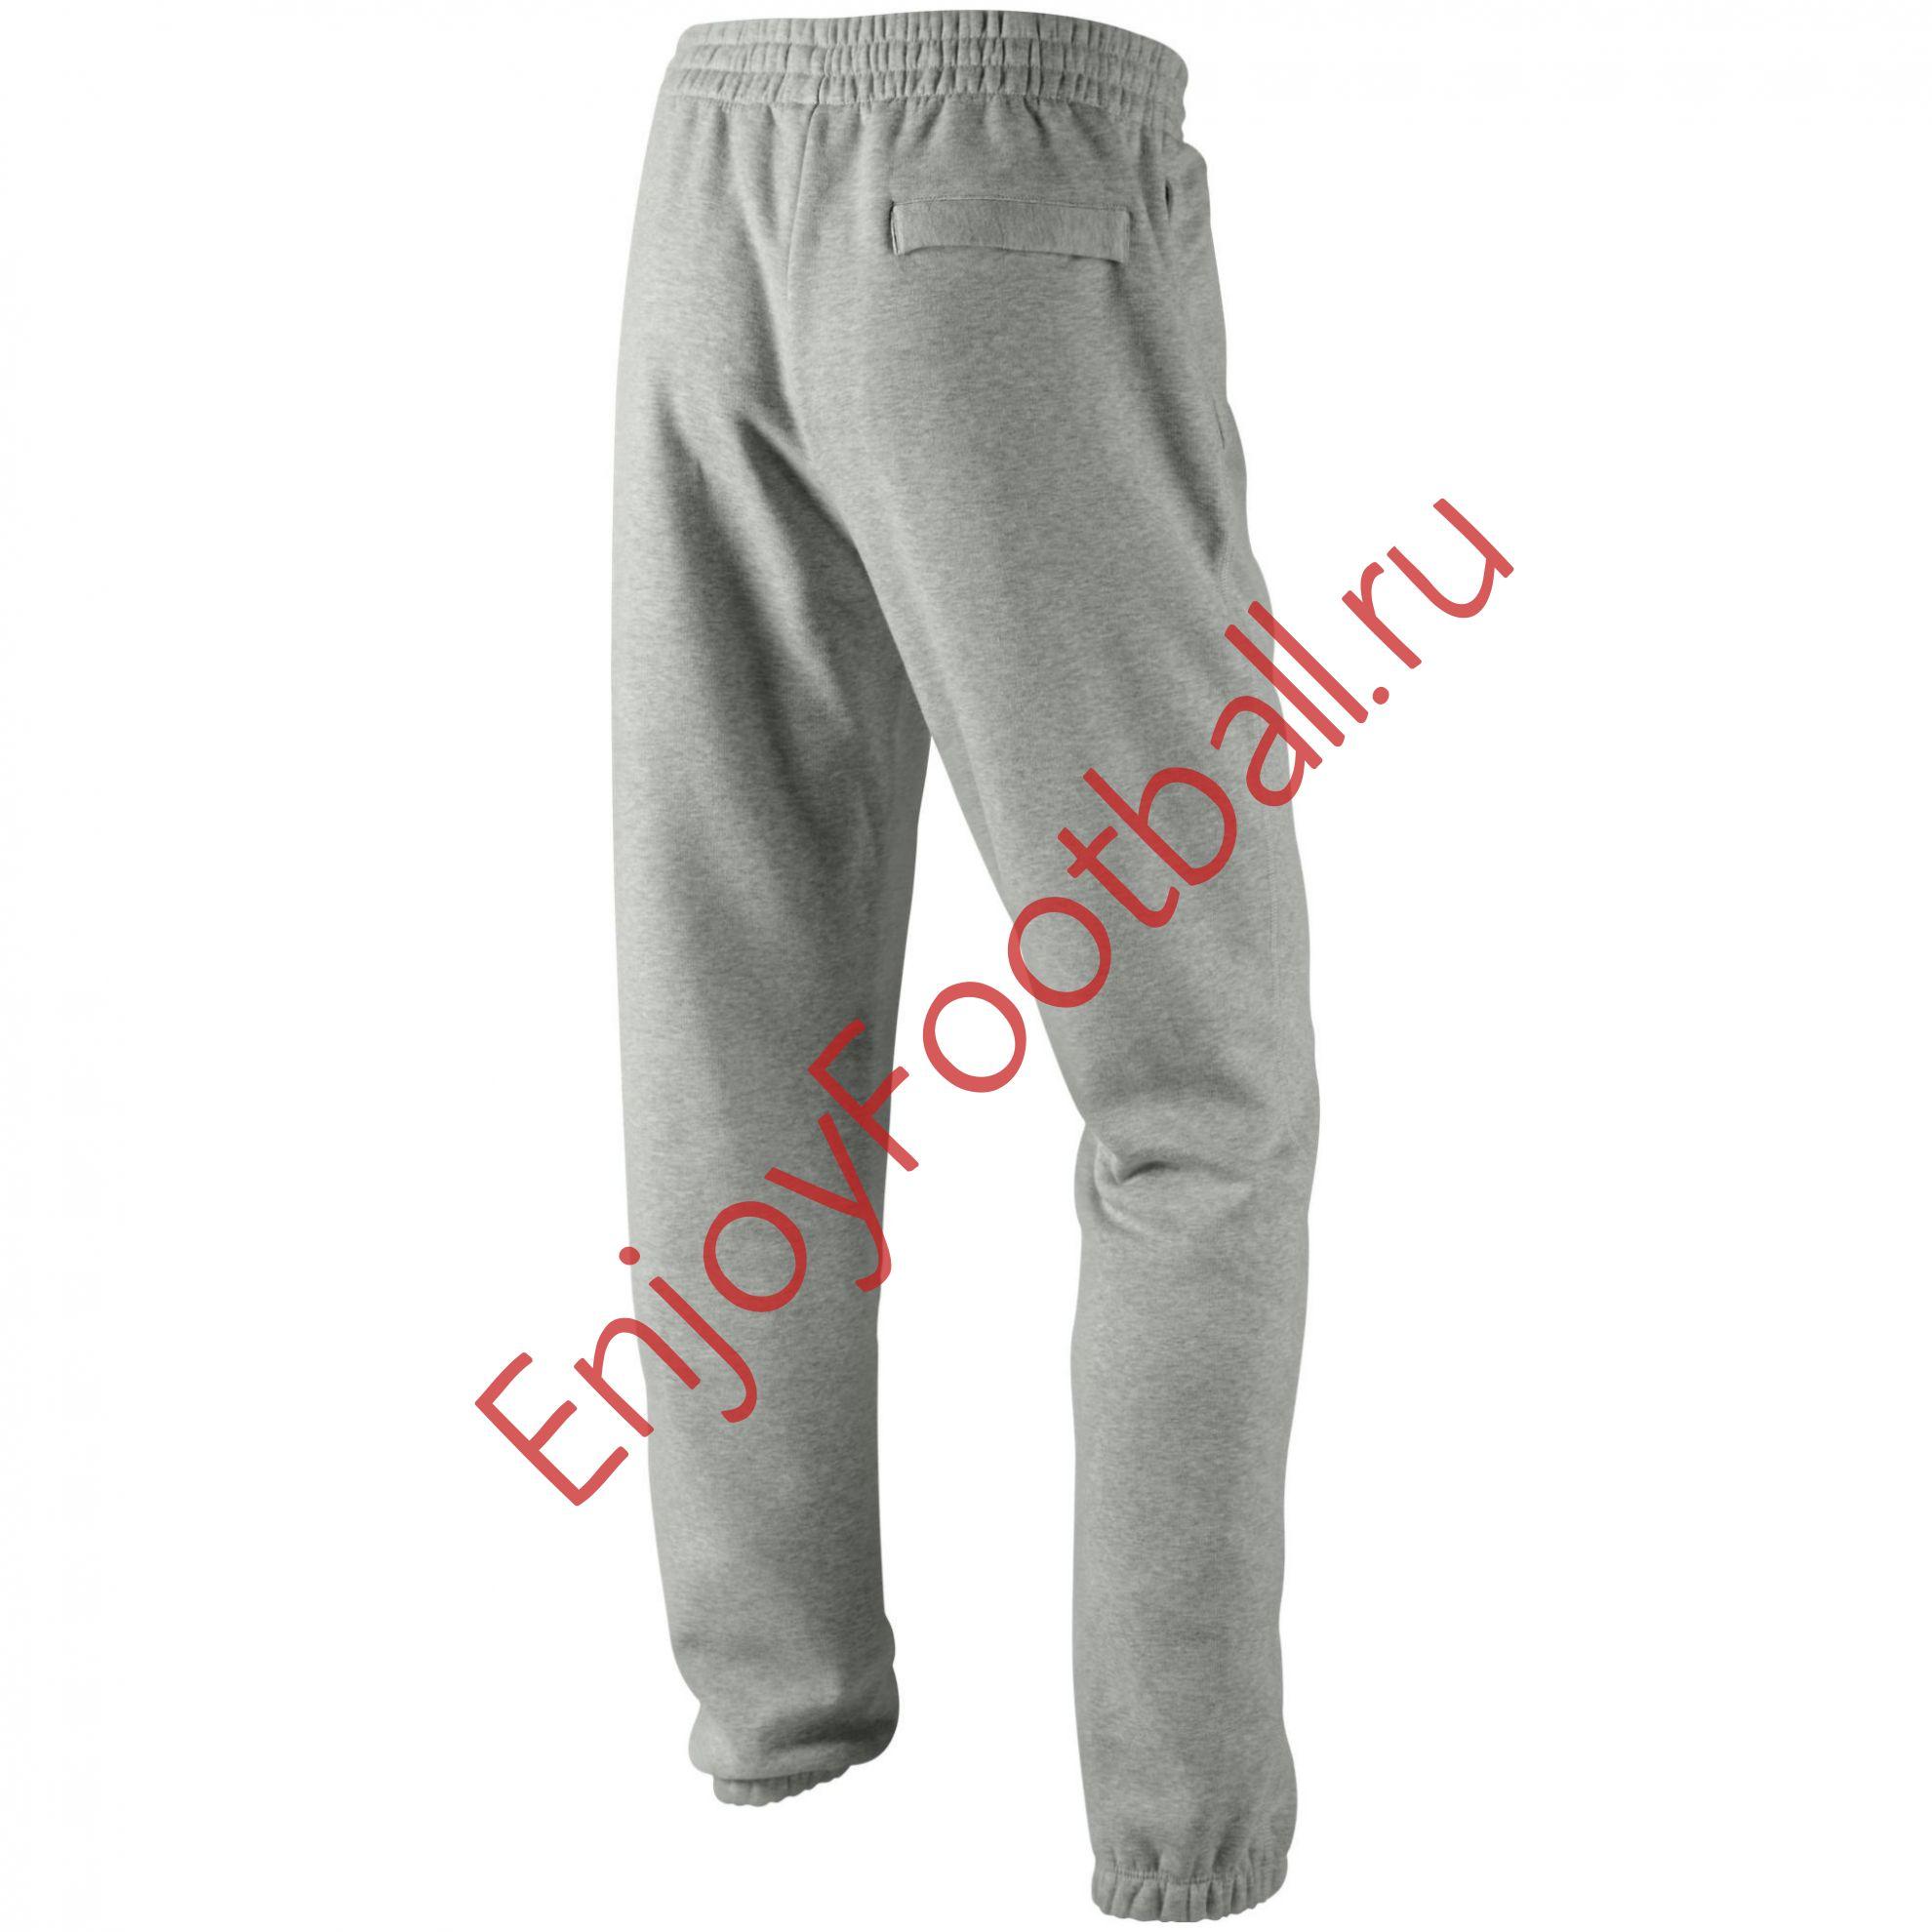 Штаны для тренировок NIKE TS FLEECE CUFF PANT 455800-050 ... 1e0eee02553